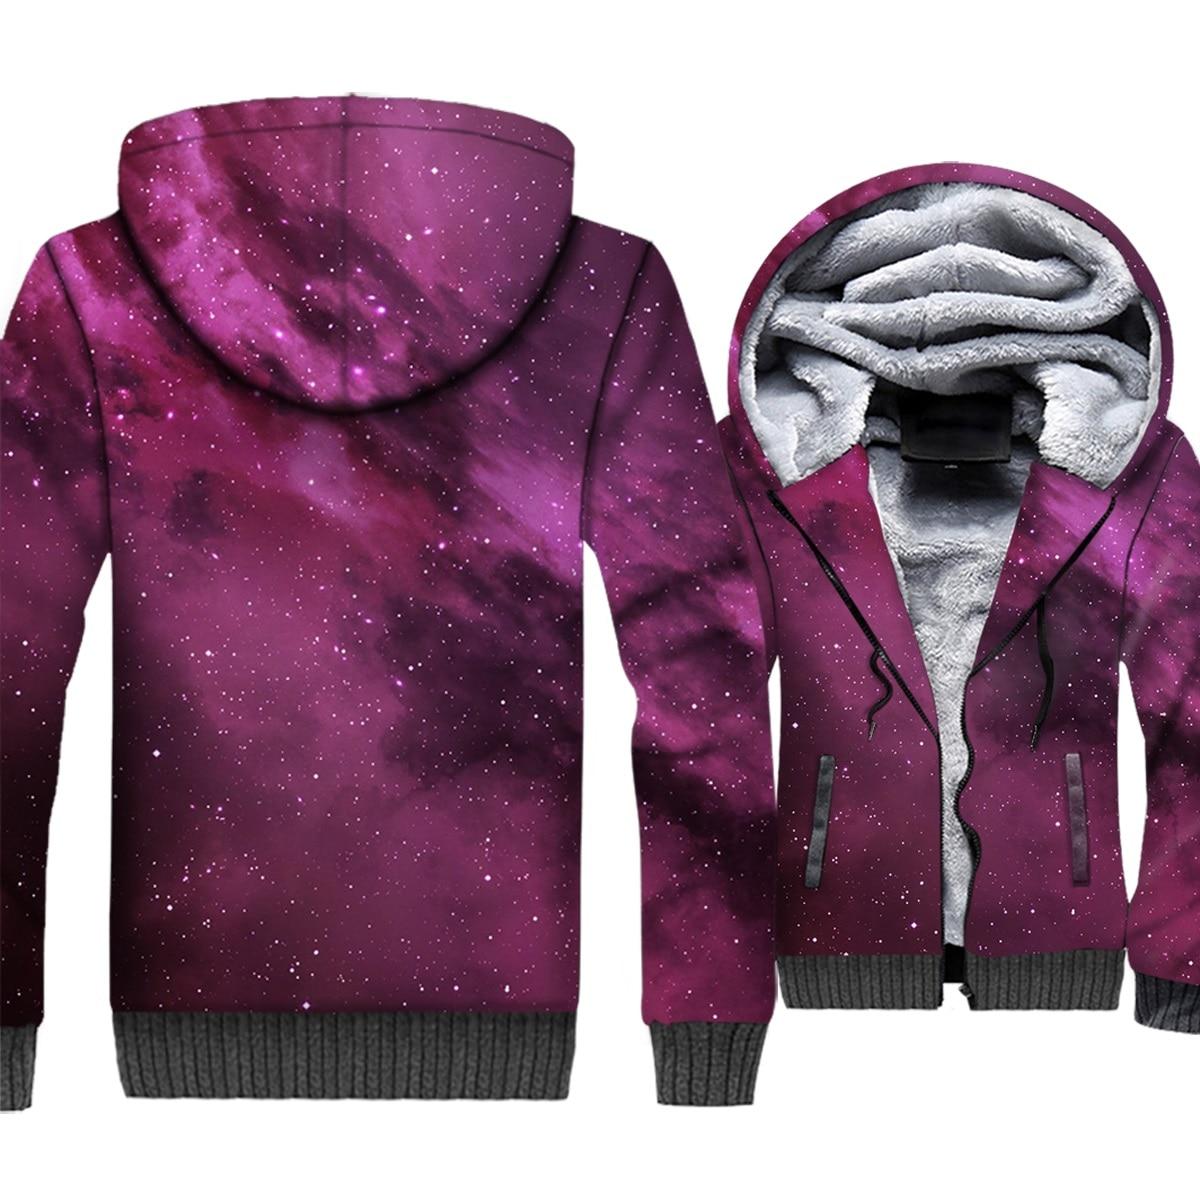 Space Galaxy 3D Hoodies Men Colorful Nebula Cap Sweatshirt Harajuku Stars Nebula Coat Winter Fleece Dreamlike Star Purple Jacket